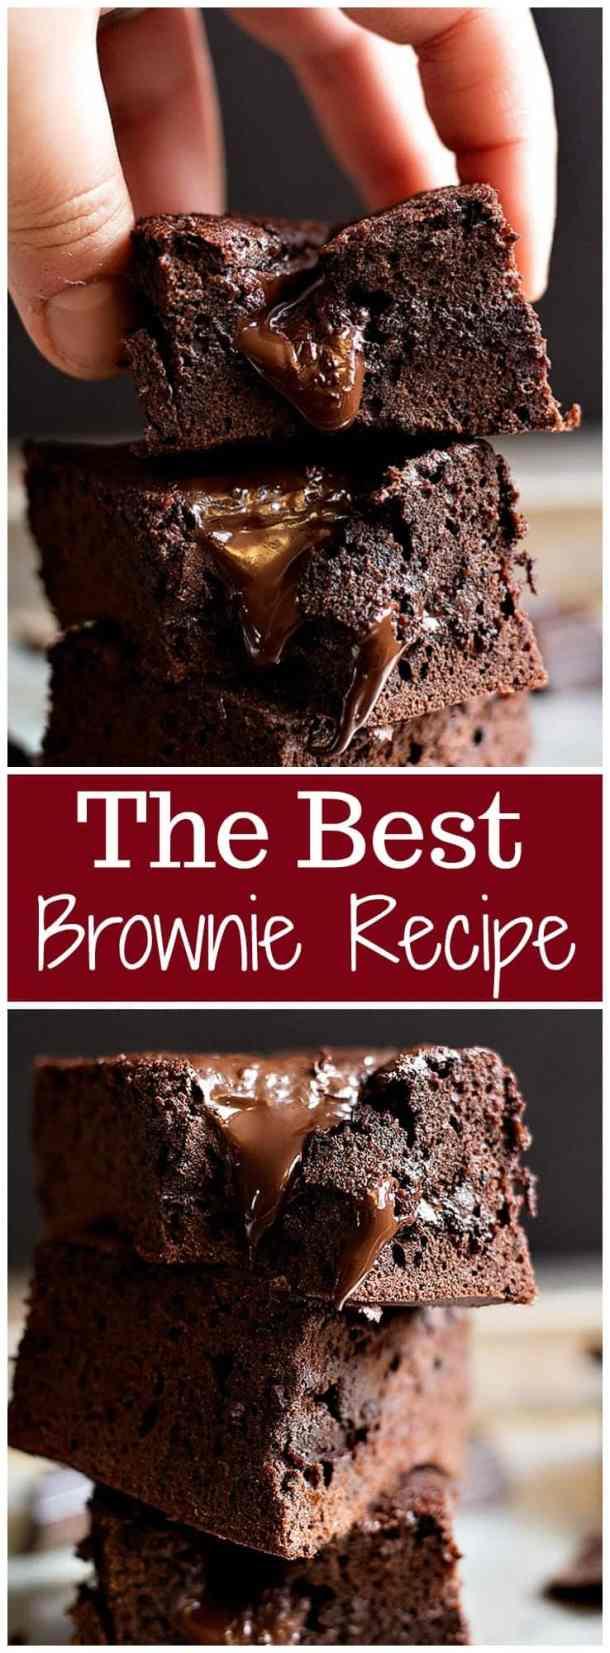 Easy brownie Recipe | Easy Brownie Recipe Simple | Quick Brownie Recipe | Brownie Recipe No Box | Brownie Recipe From Scratch | Brownie recipe easy | brownie recipe homemade | Brownie recipes with cocoa powder | Best Brownies recipe | Unicornsinthekitchen.com